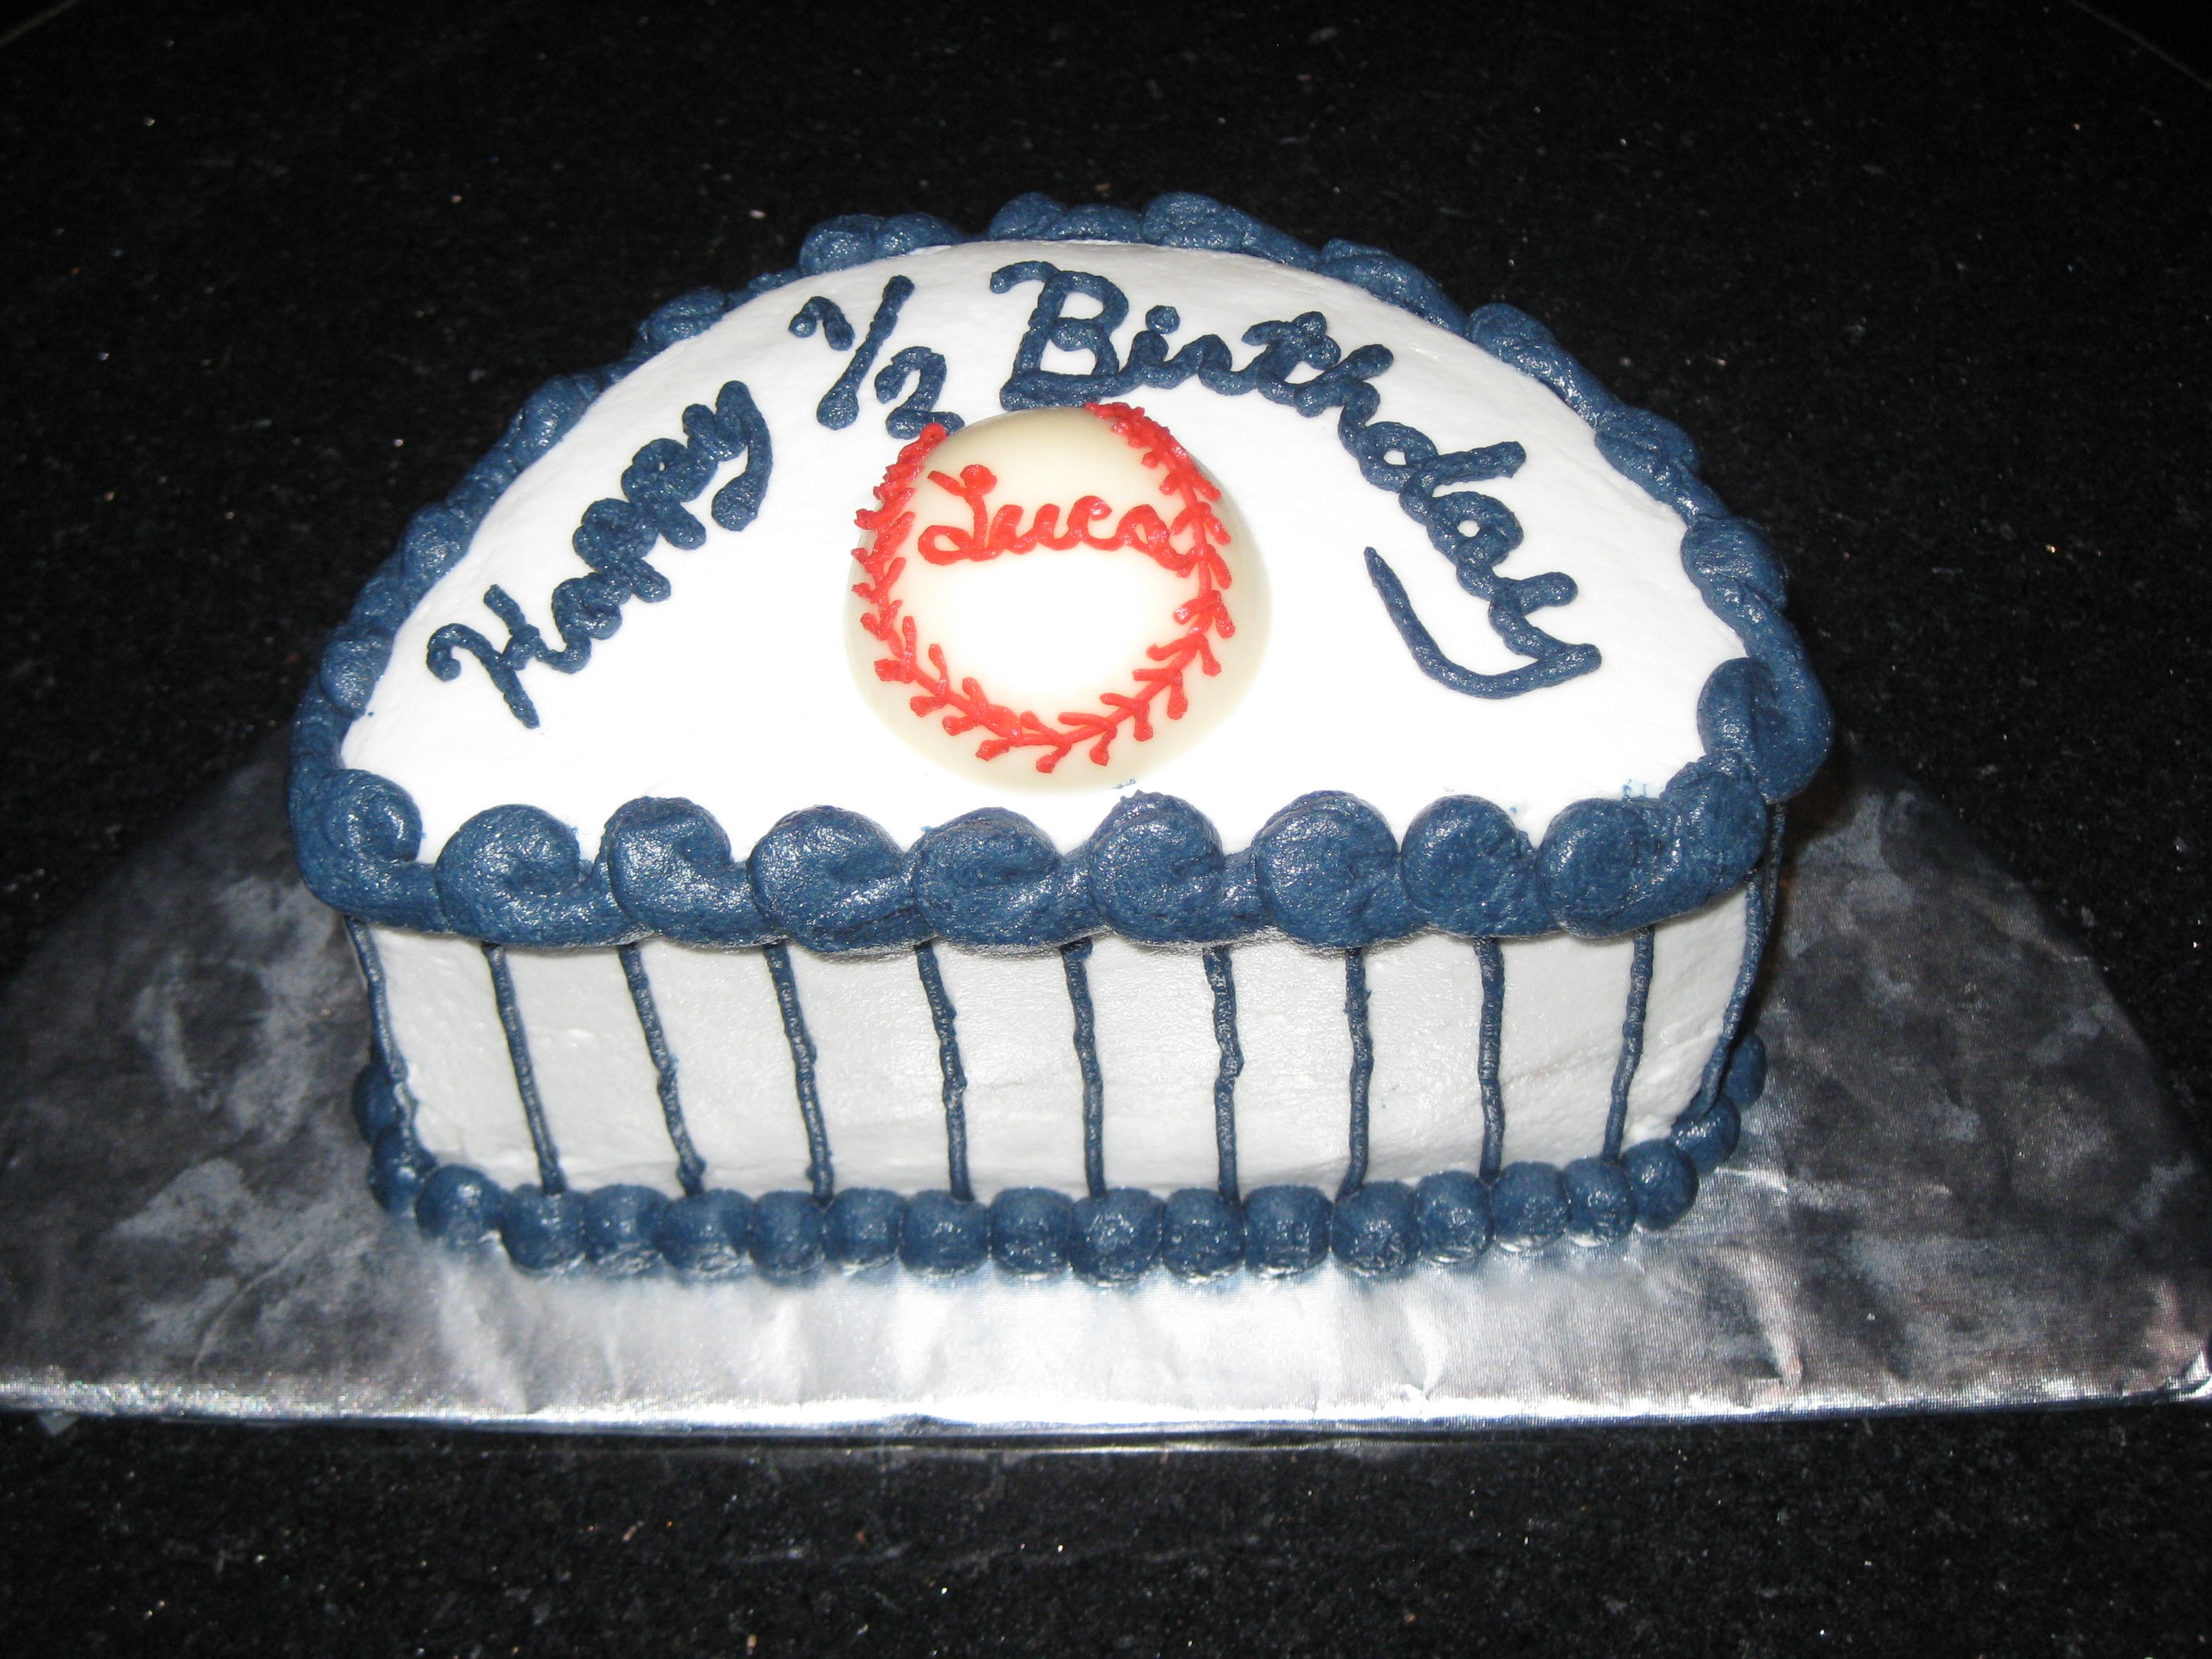 Baseball Half Birthday Cake My Baking Projects Pinterest Half